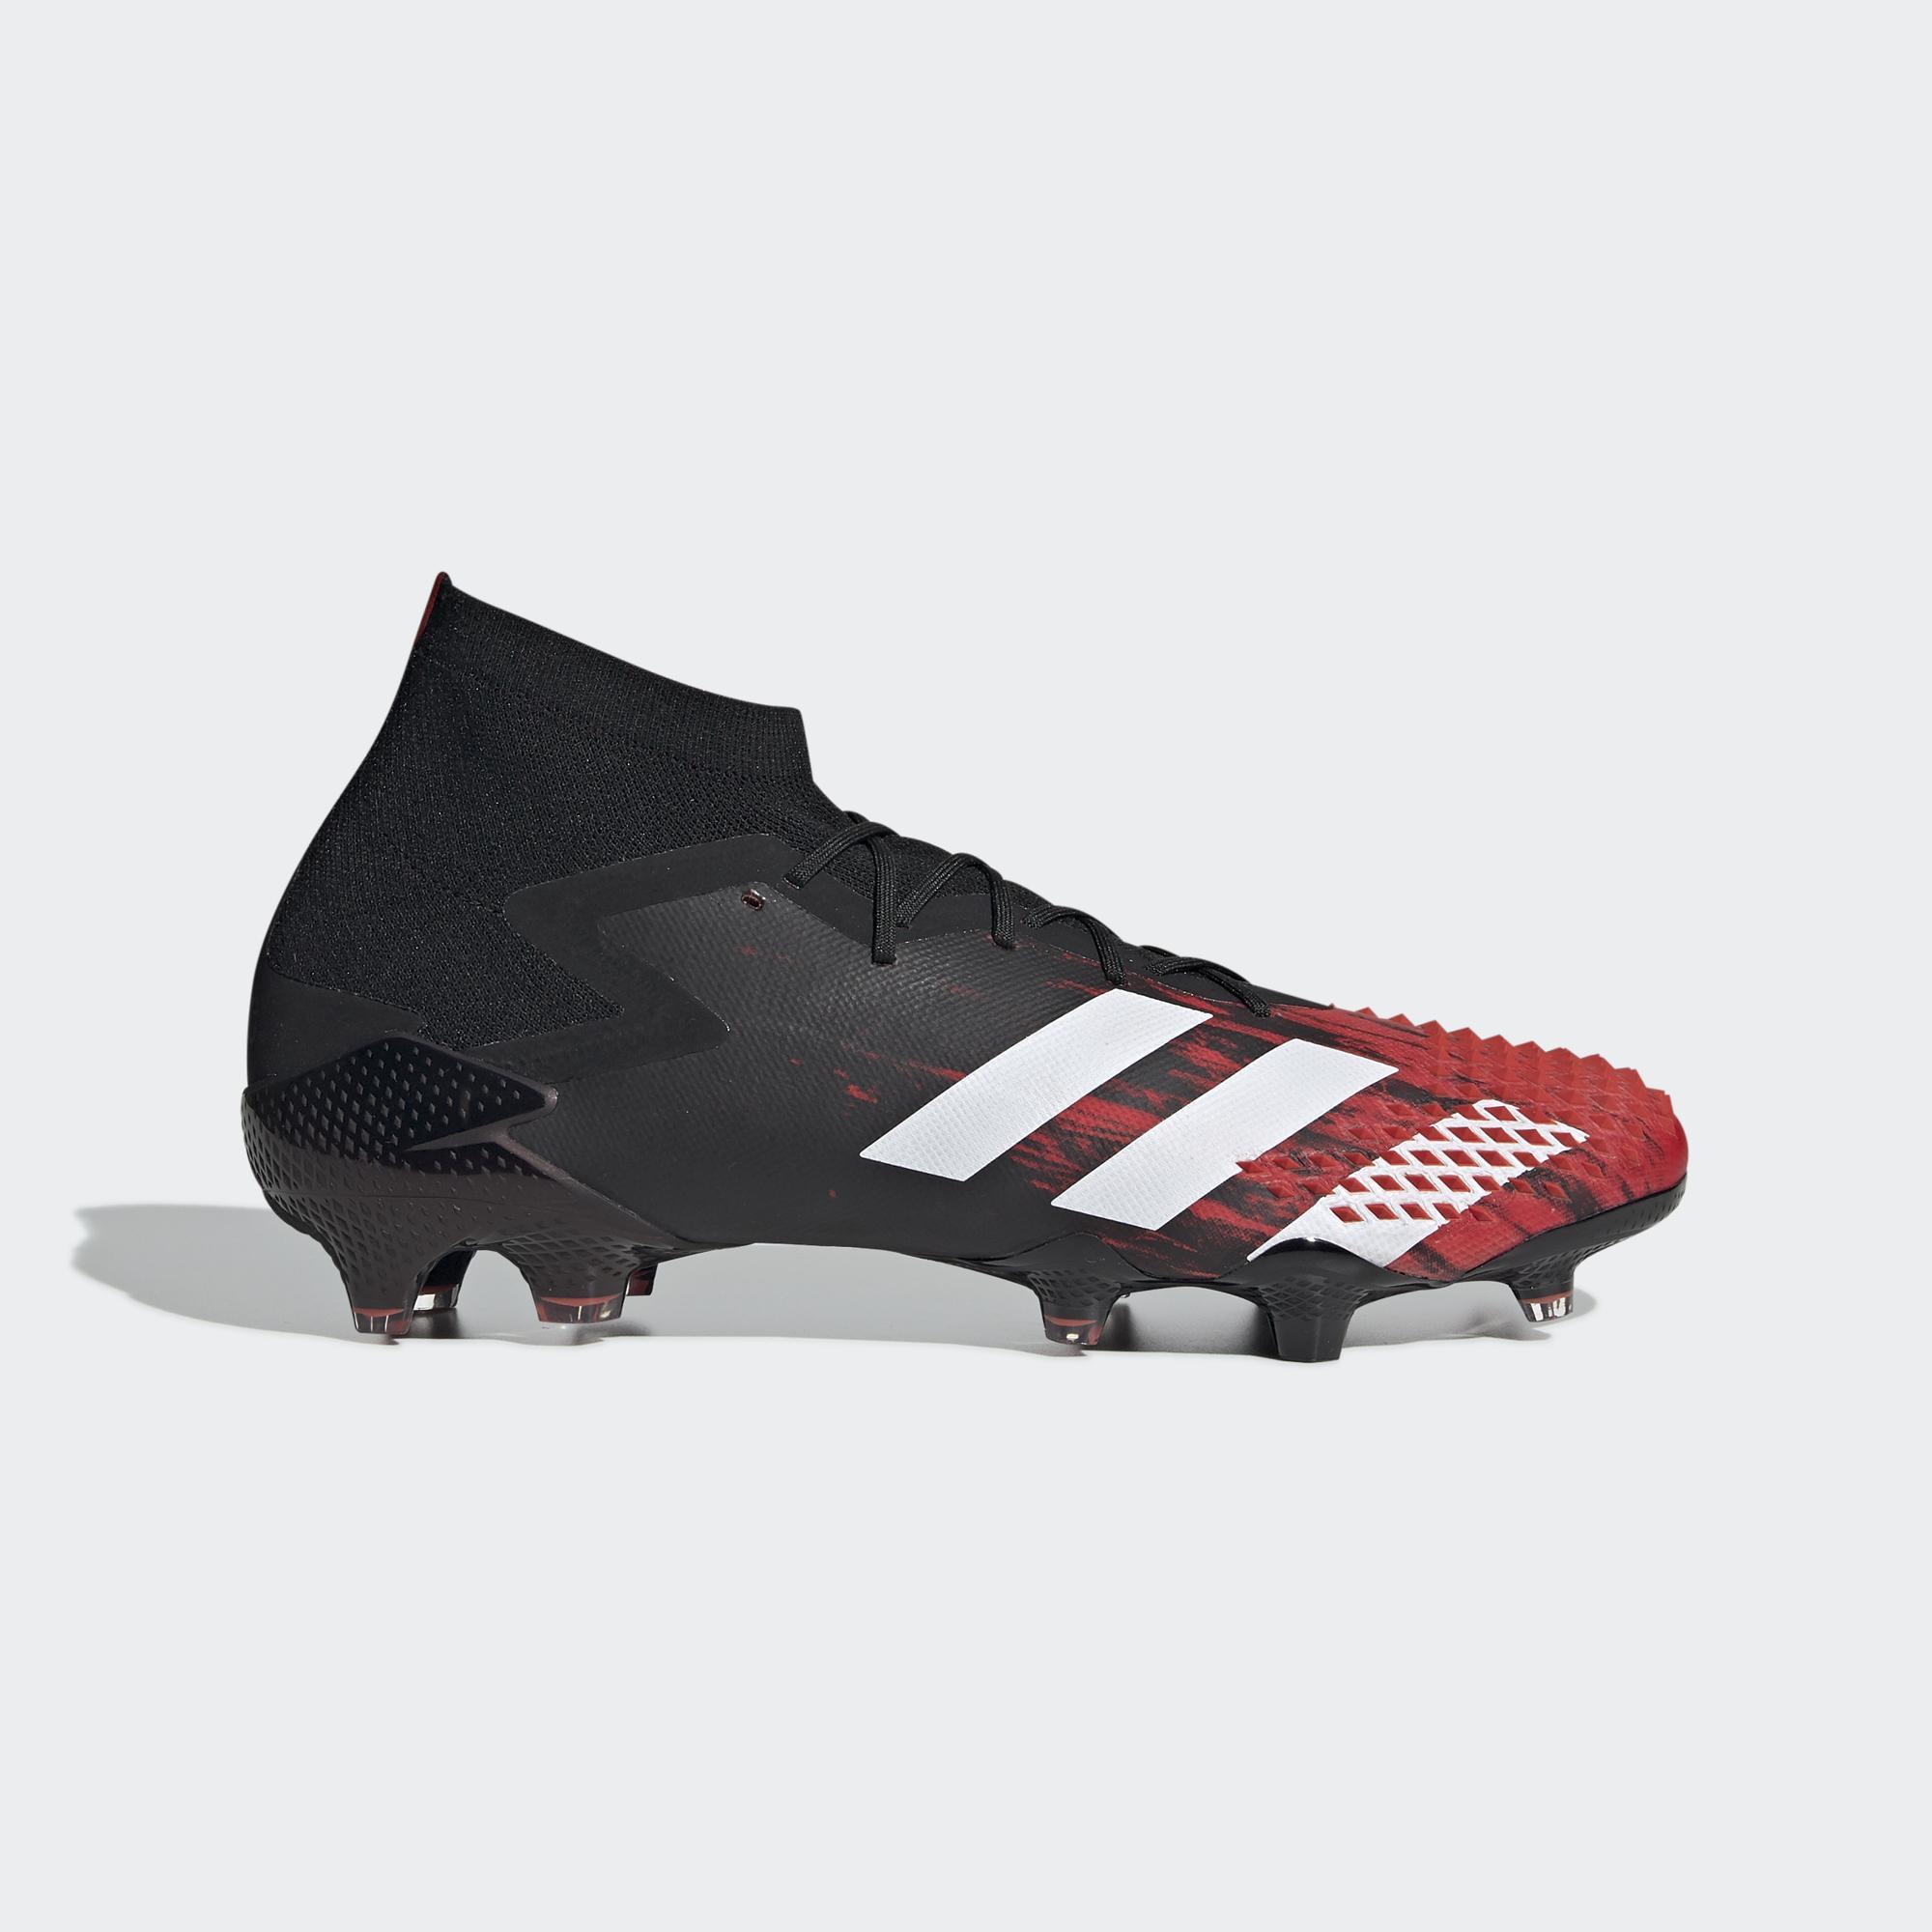 Adidas Scarpe Calcio Predator Dracon 20.1 Fg